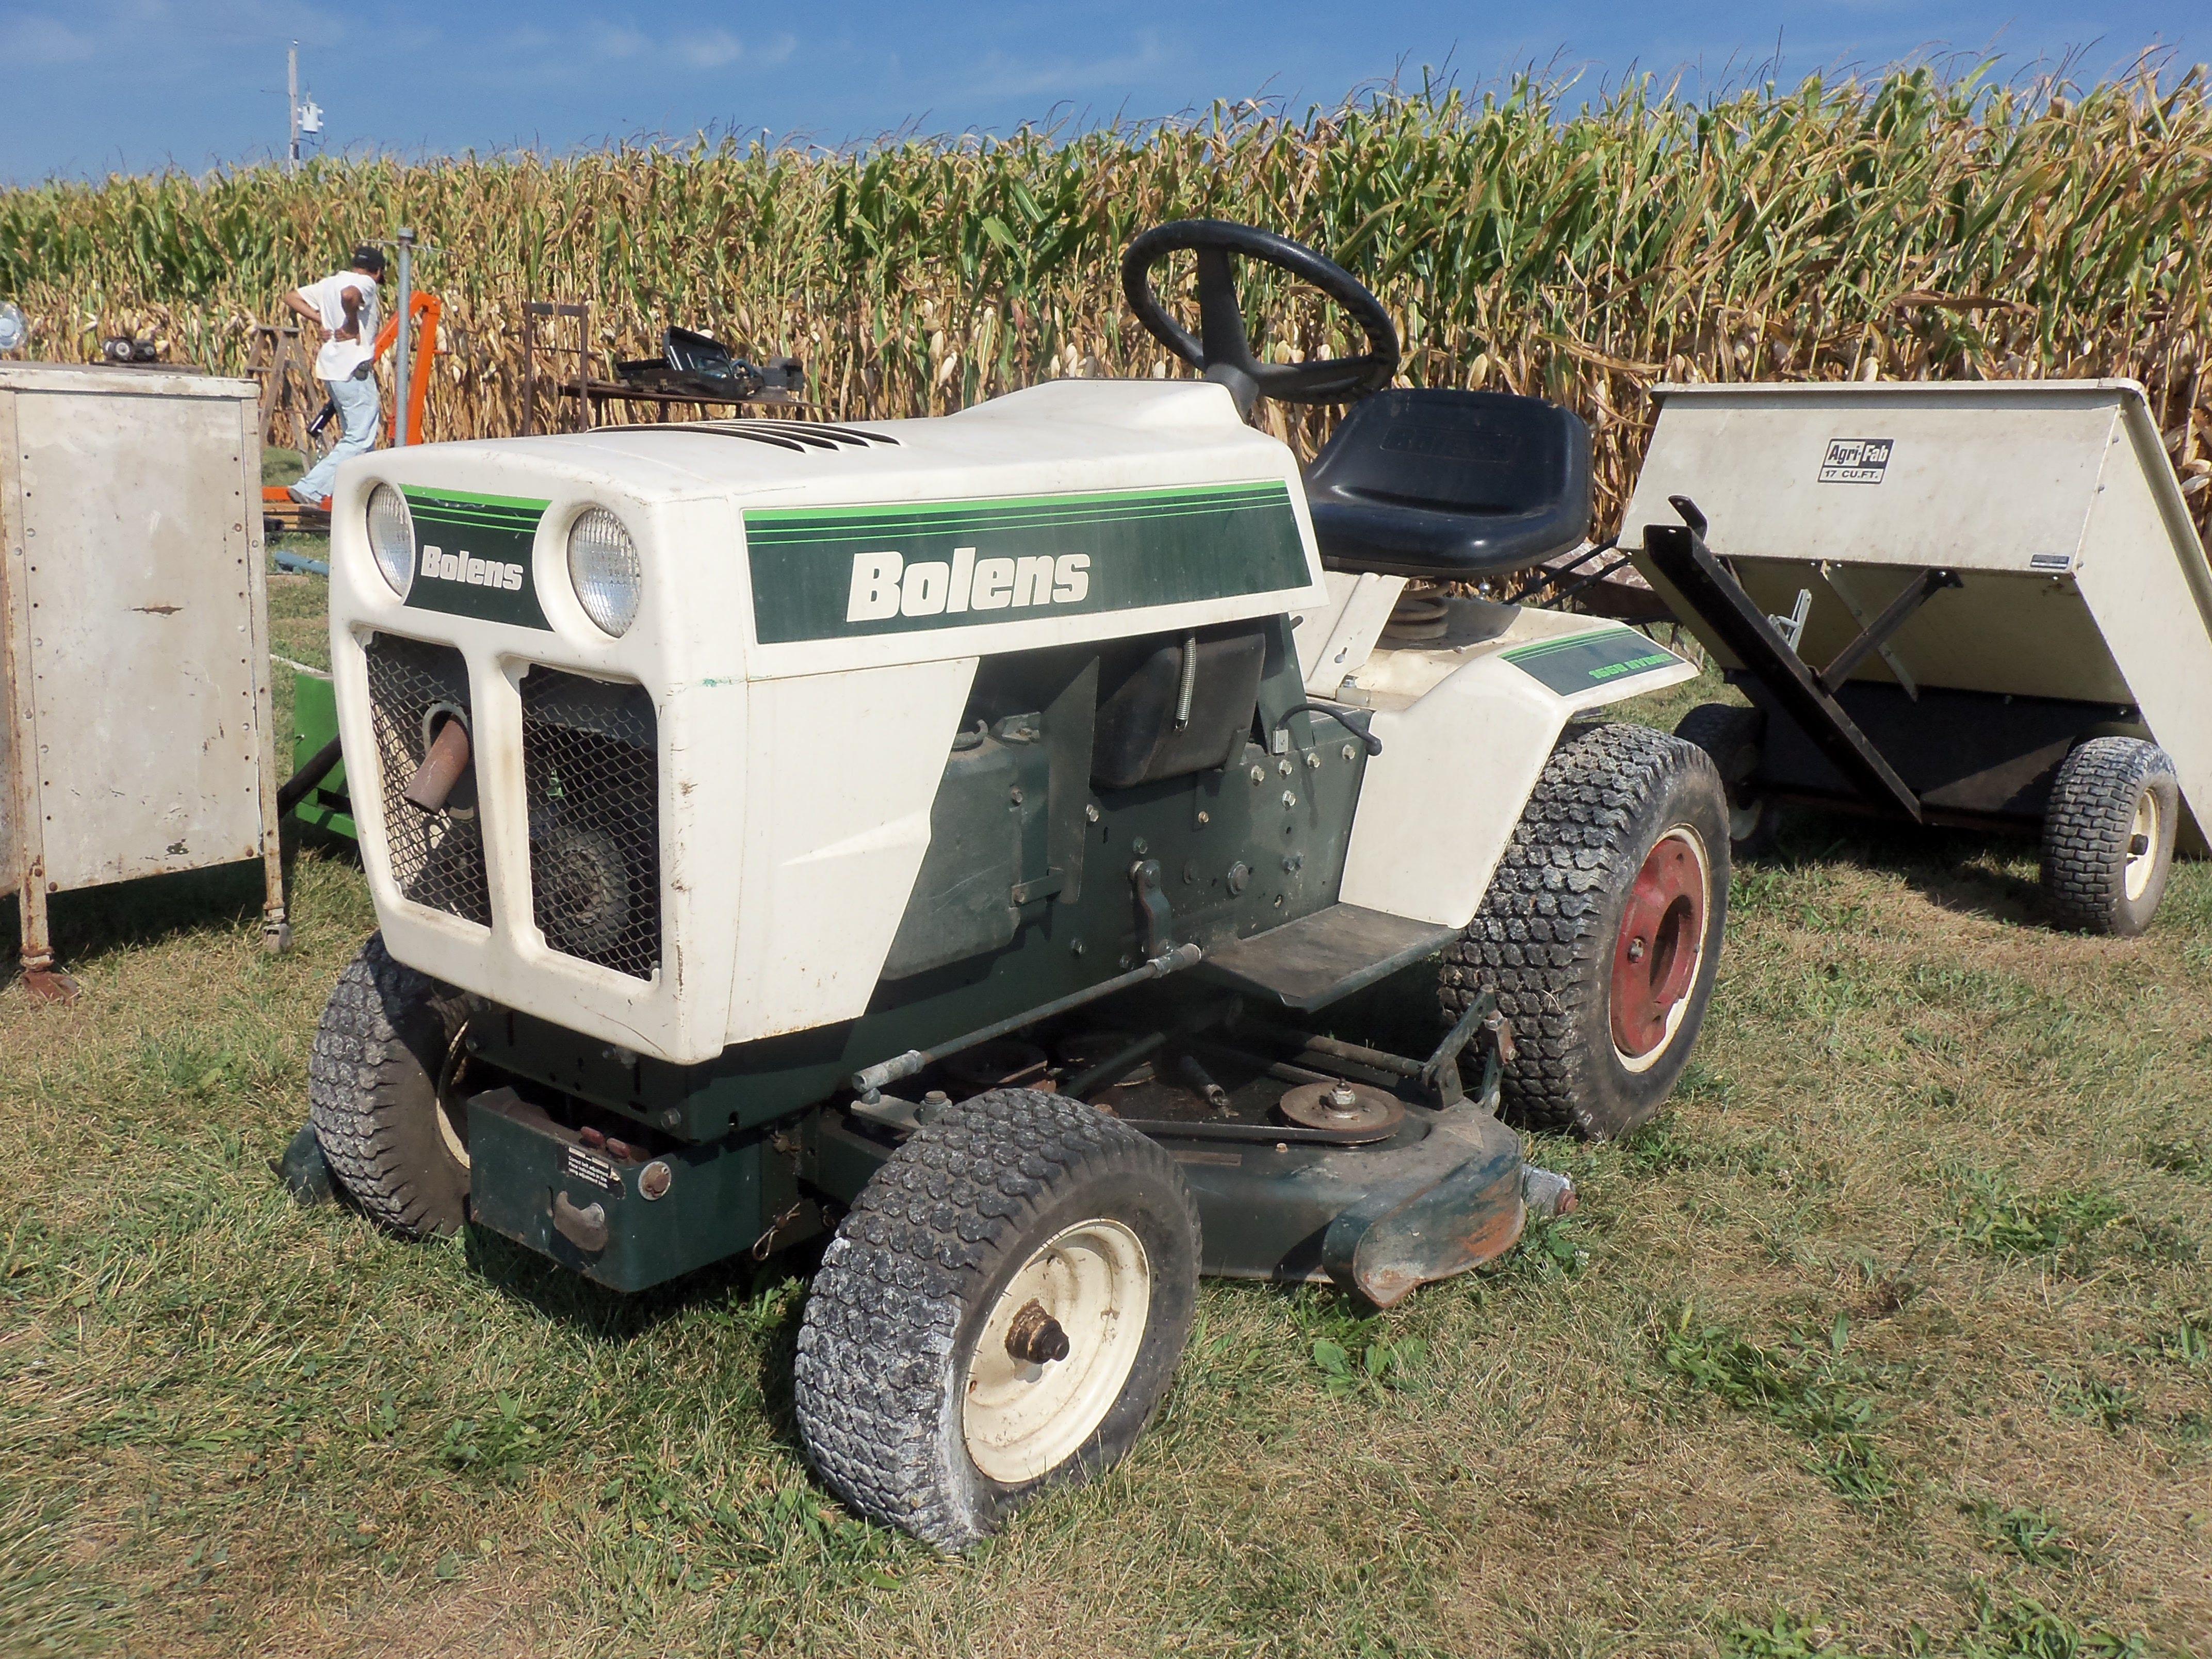 Bolens 1668 Hydro lawn & garden tractor | Farm Equipment